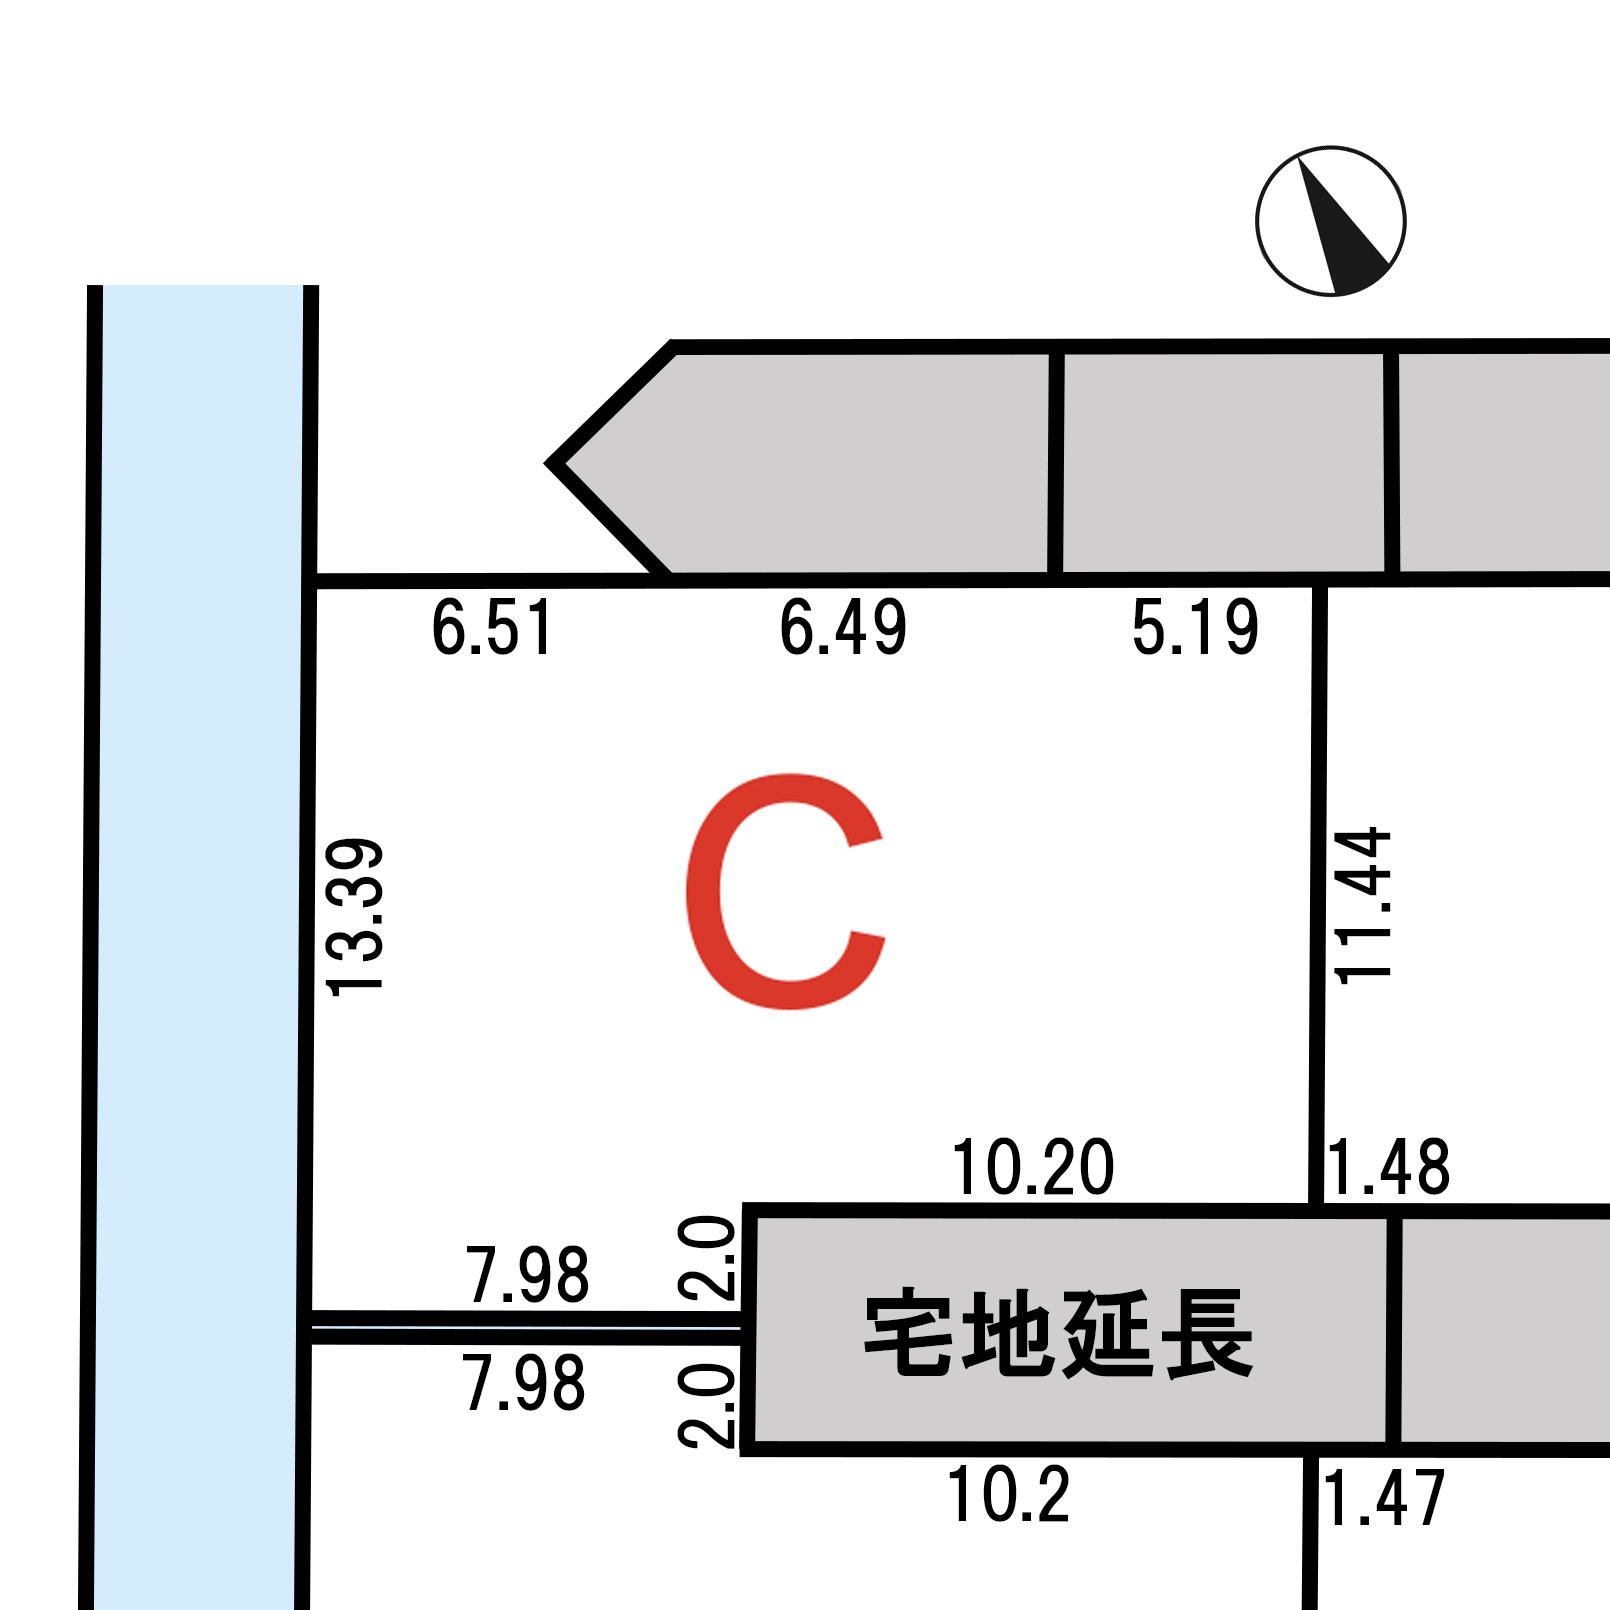 諏訪市上川二丁目 C区画_サブ画像02